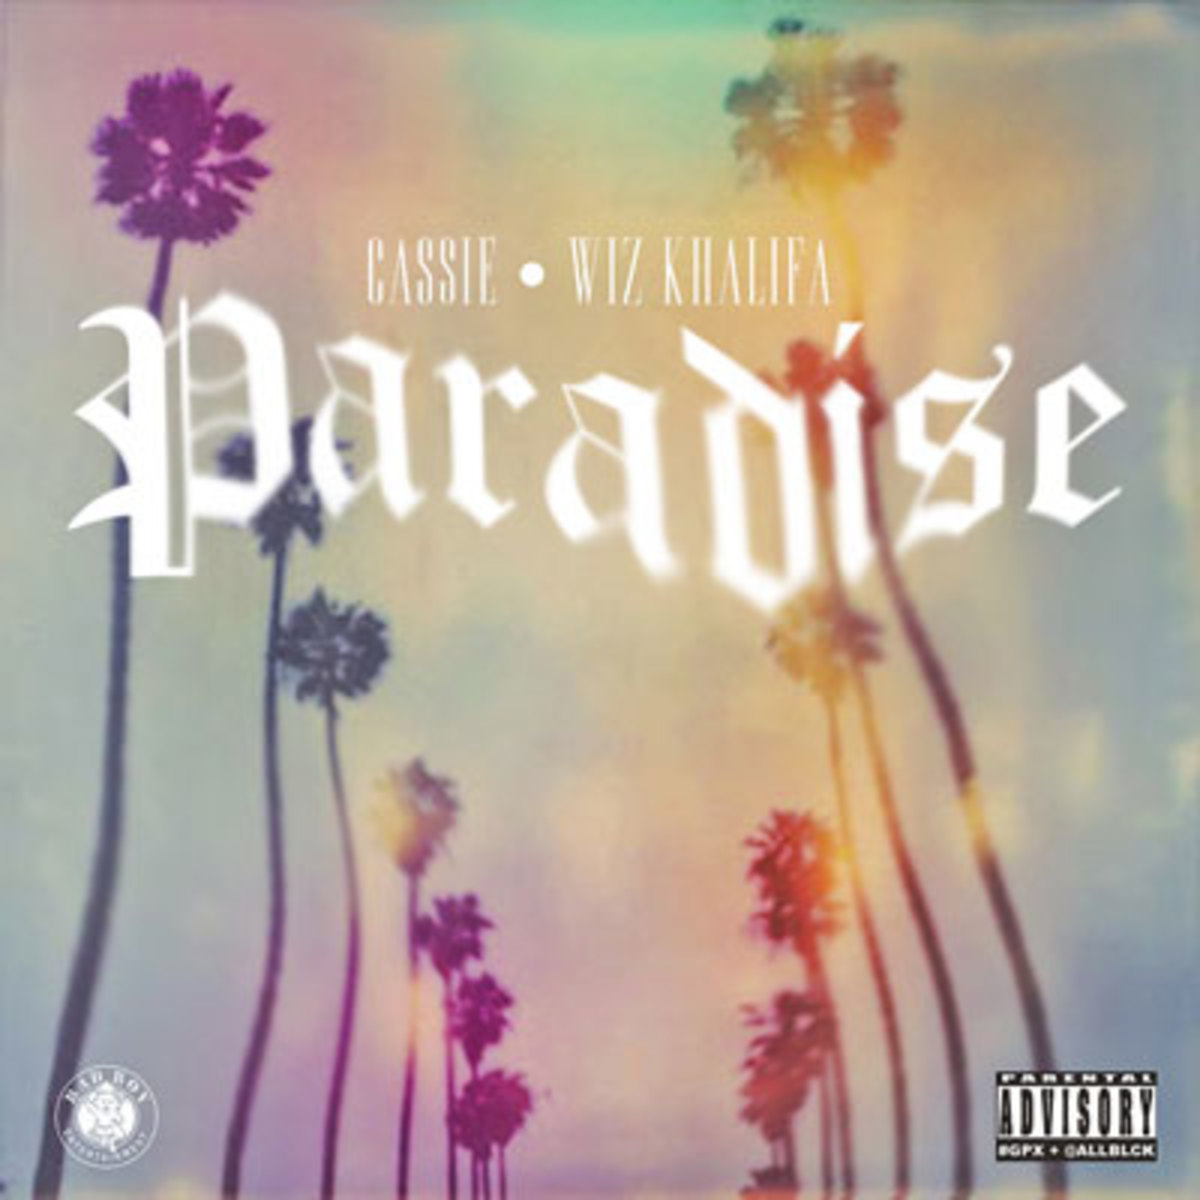 cassie-paradise.jpg